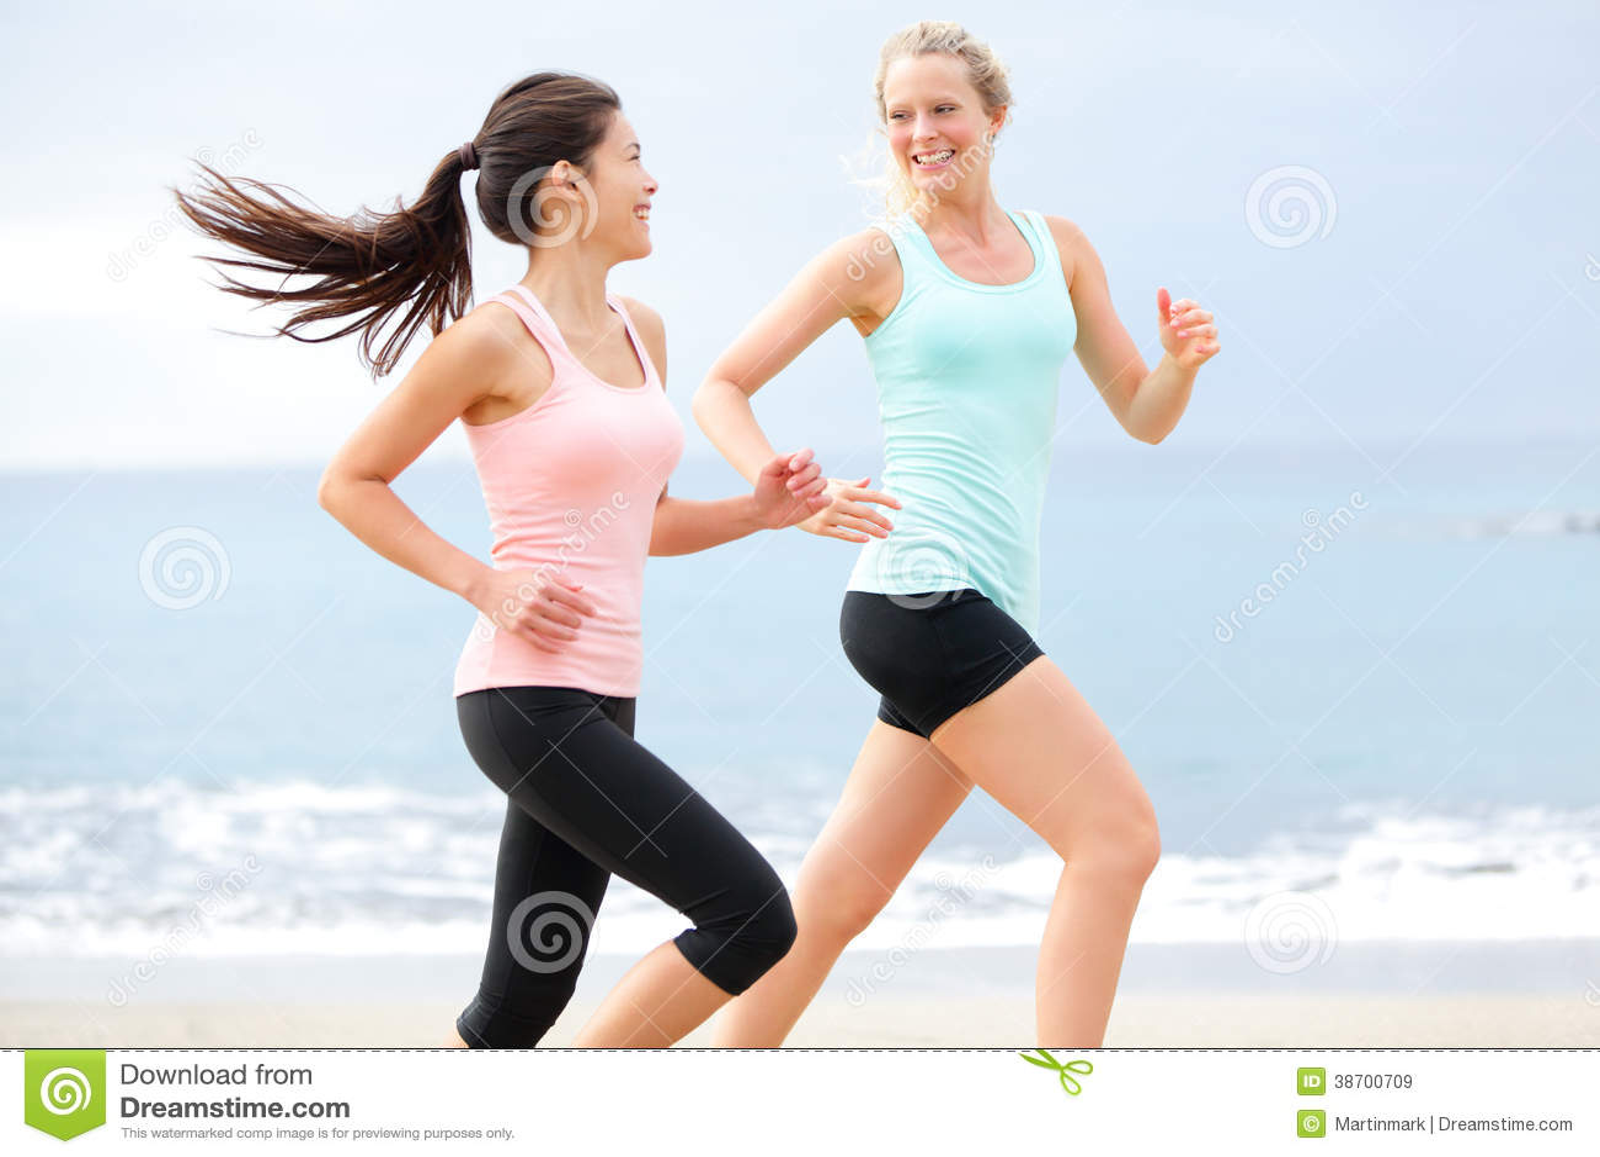 Exercise running women jogging happy on beach